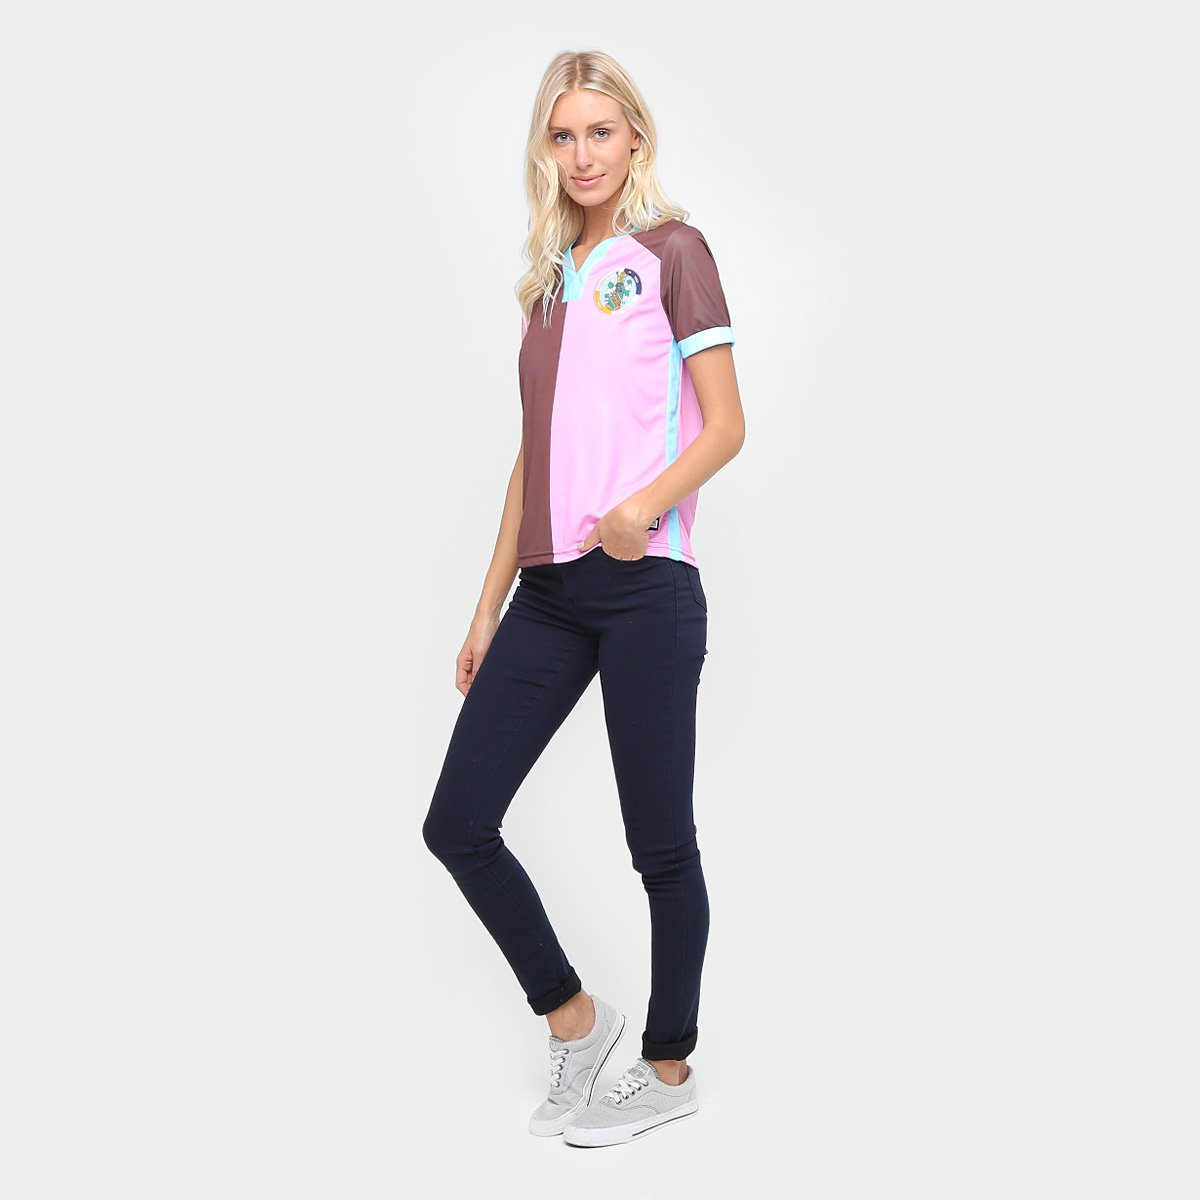 Camisa Corinthian Casuals Home 17 18 Torcedor Feminina - Marrom e ... 830eaac7c19b4